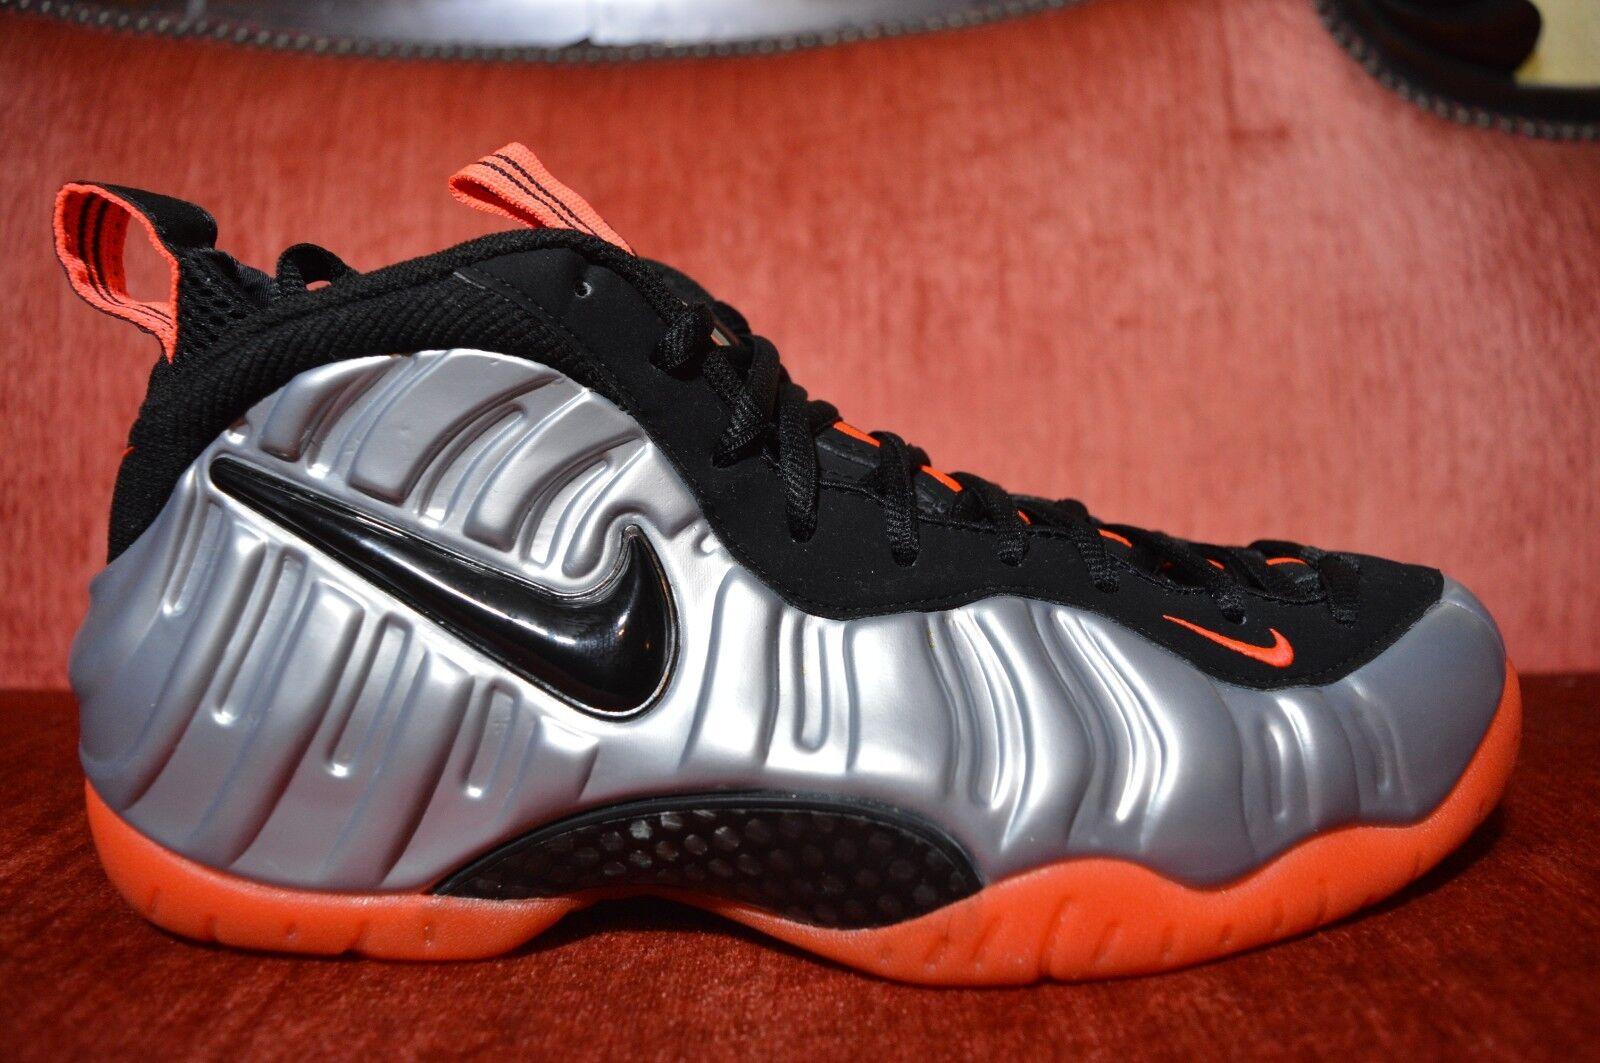 WORN TWICE 2012 Nike Air Foamposite Pro CRIMSON Silver Red 2012 TWICE Size 10.5 624041-016 872280